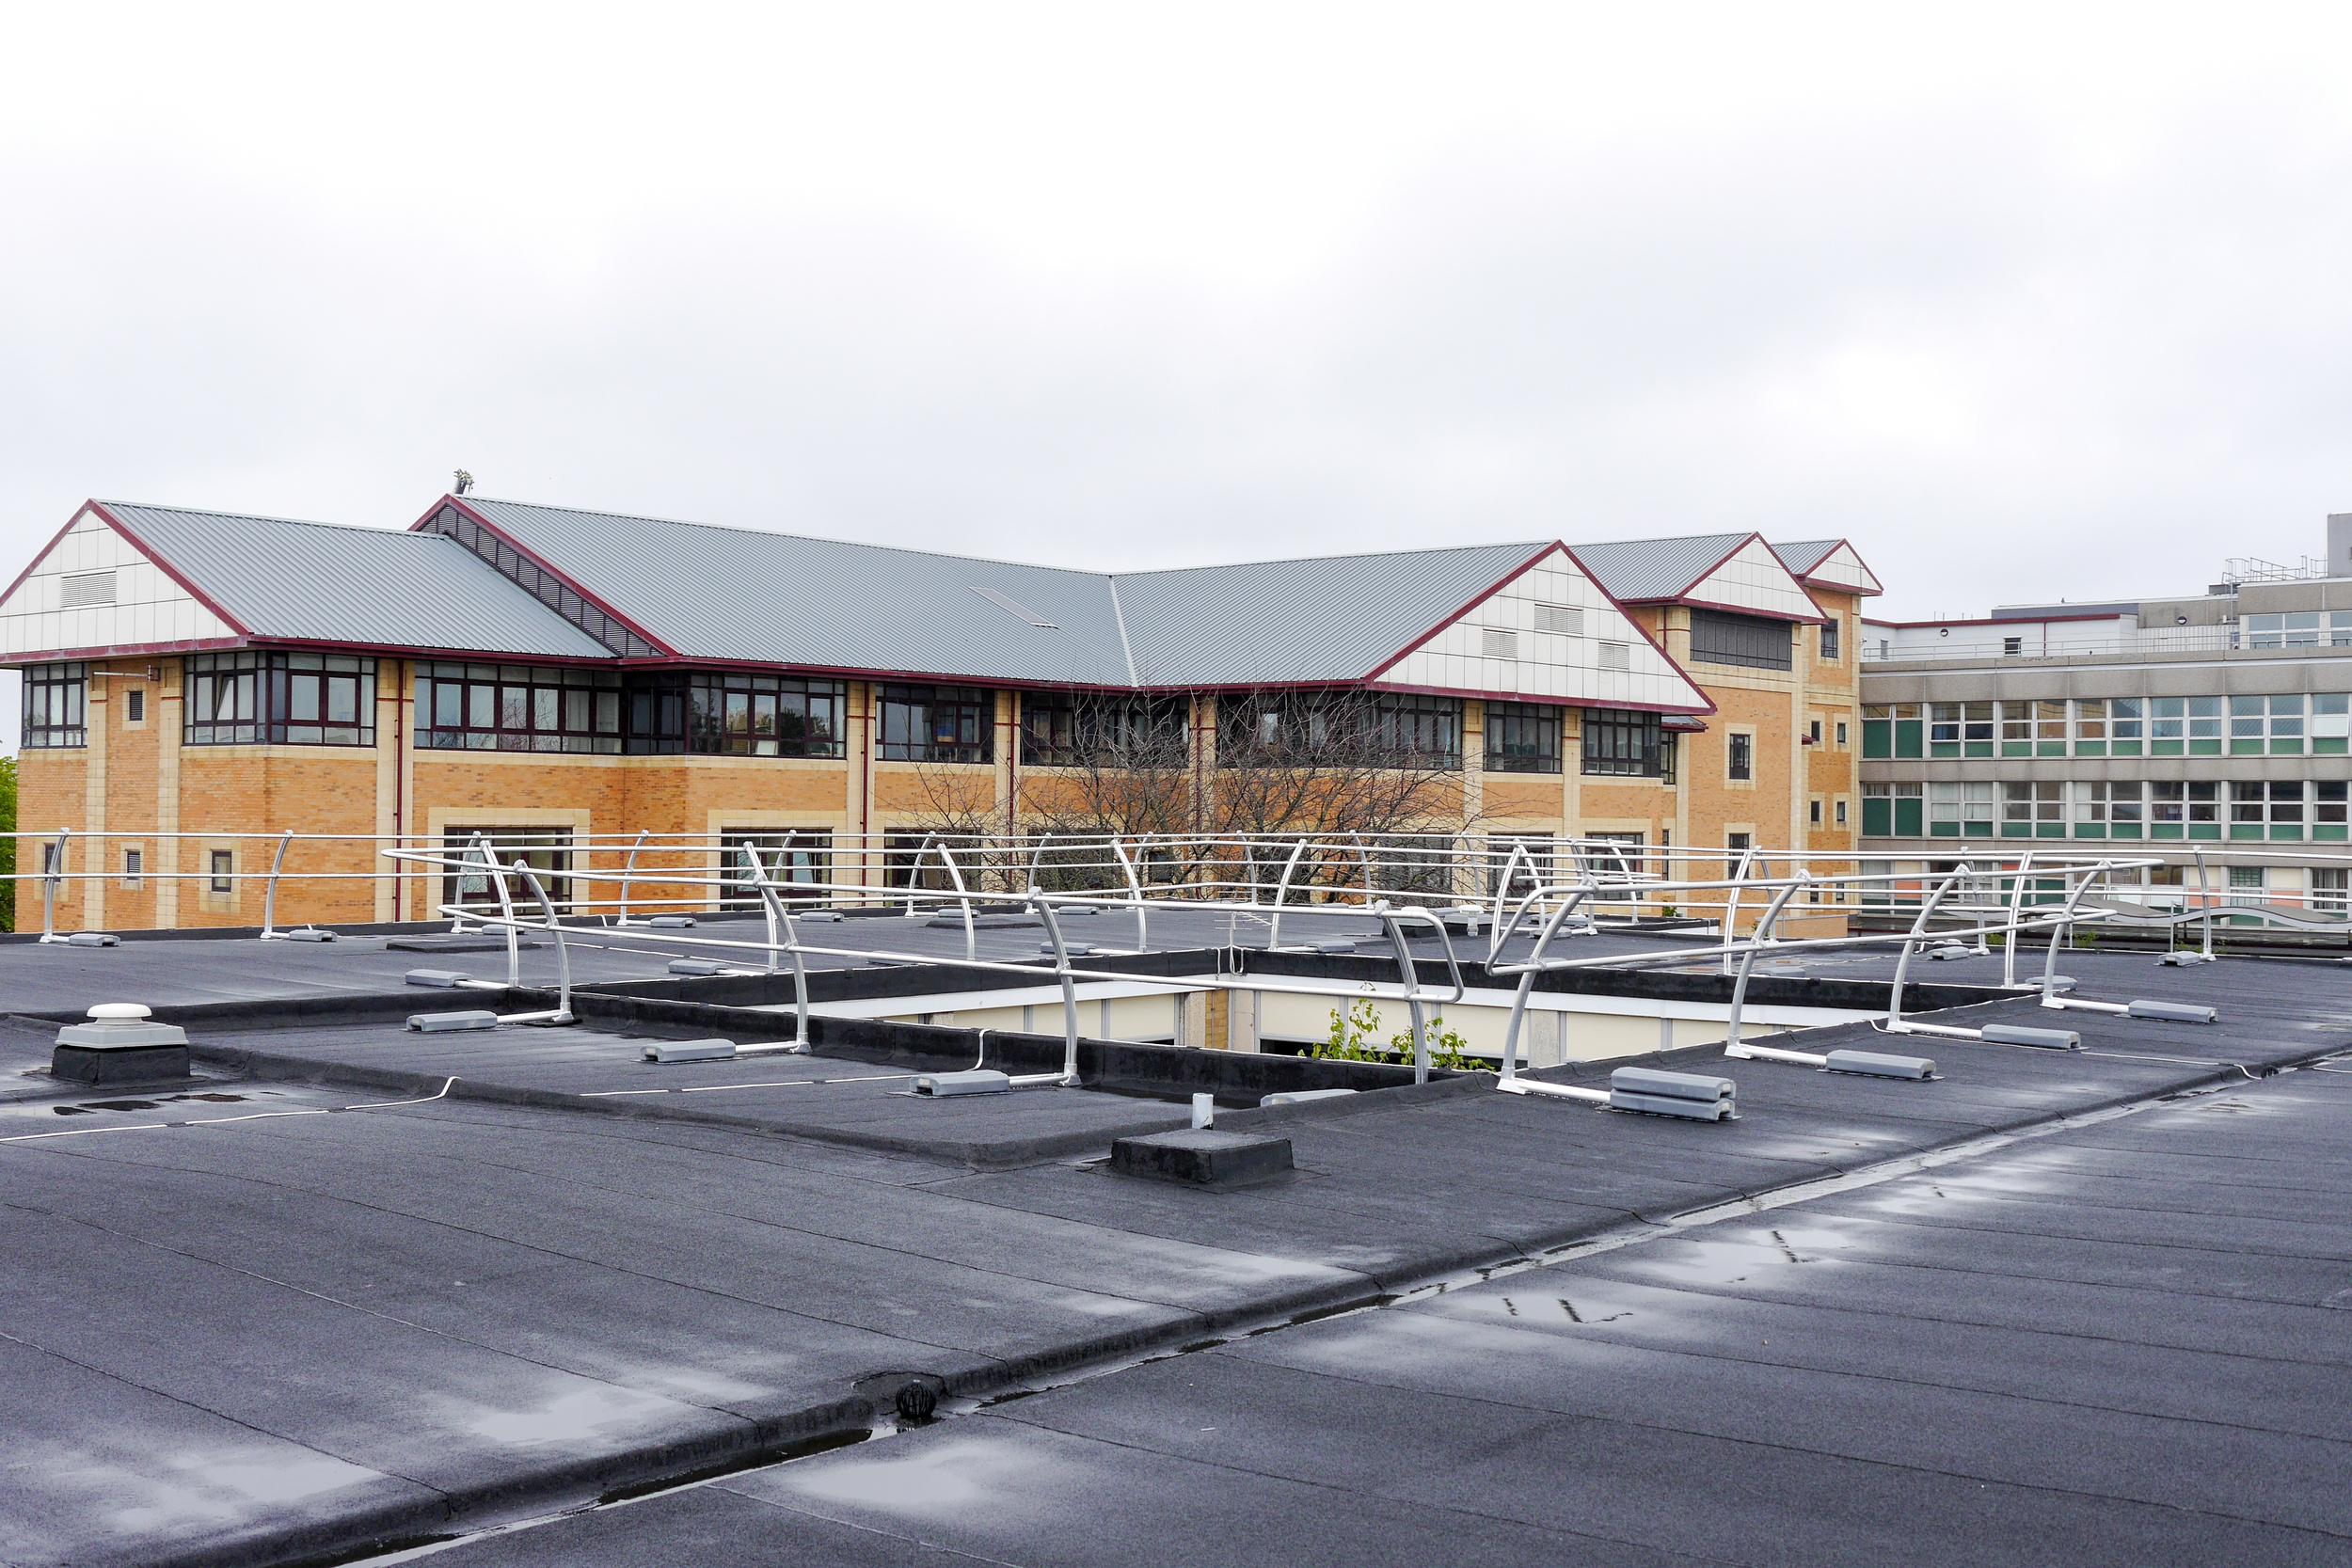 St Mary's Hospital new building